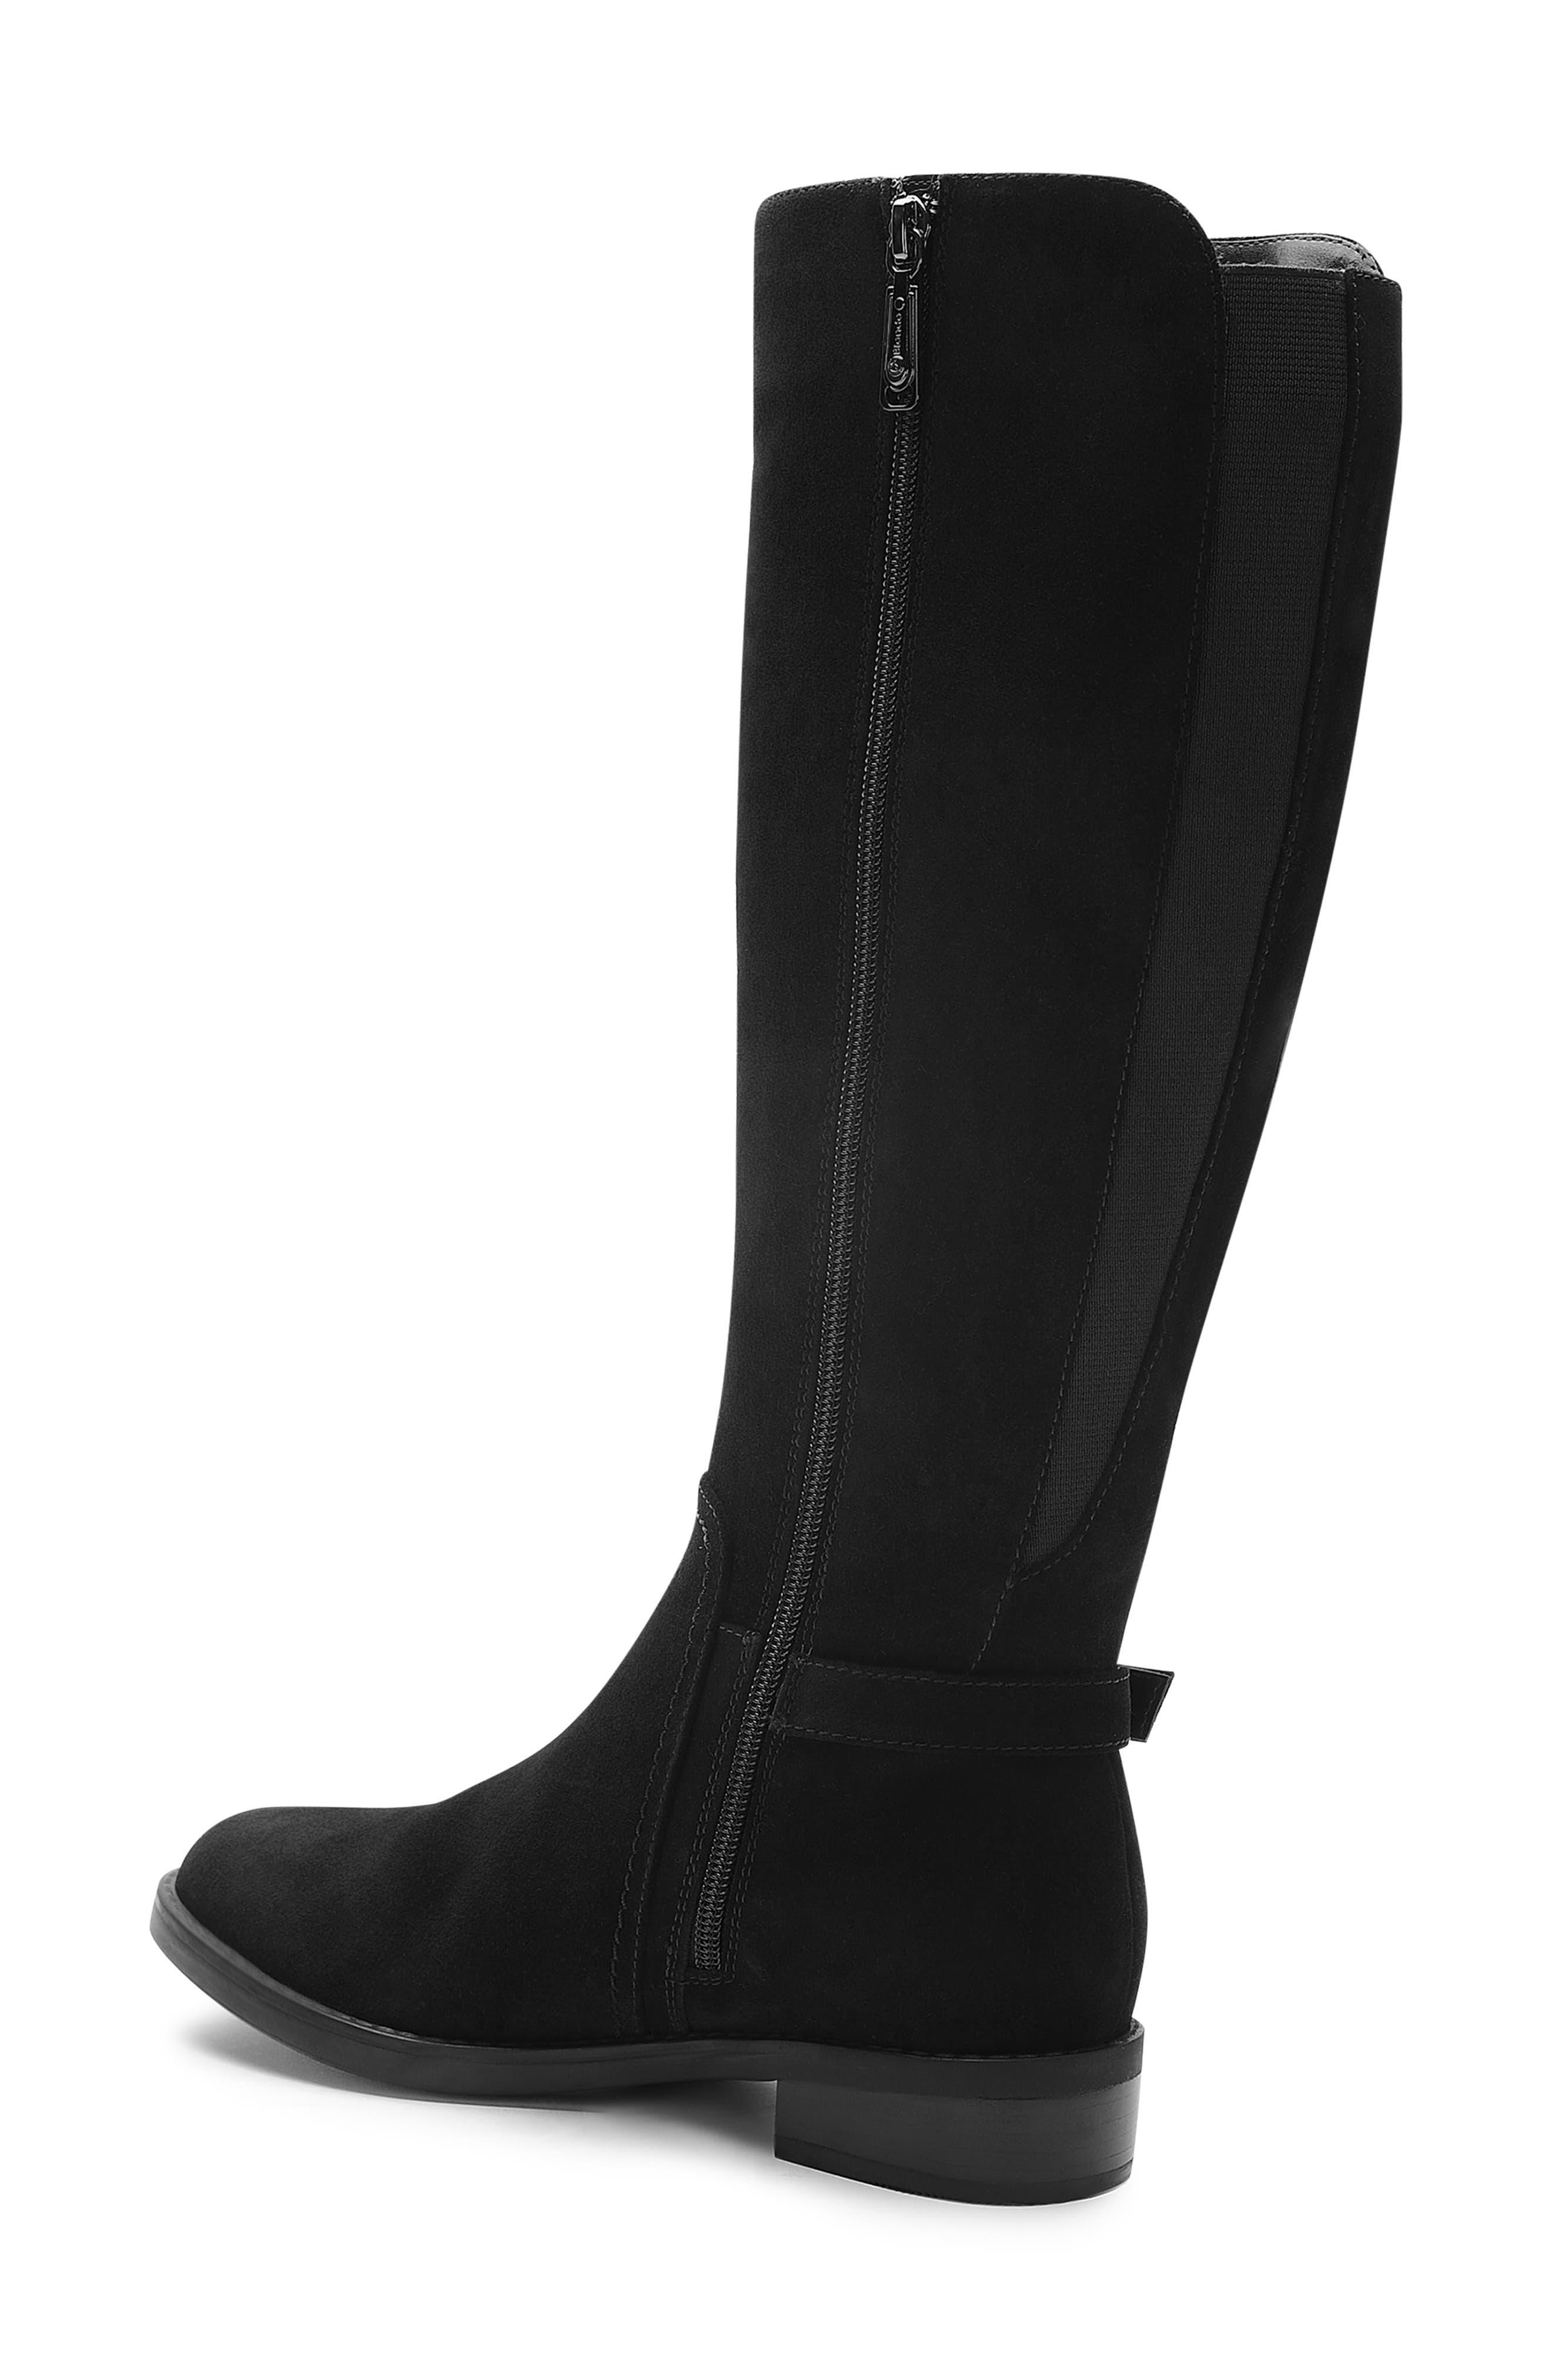 Evie Riding Boot,                             Alternate thumbnail 2, color,                             BLACK SUEDE